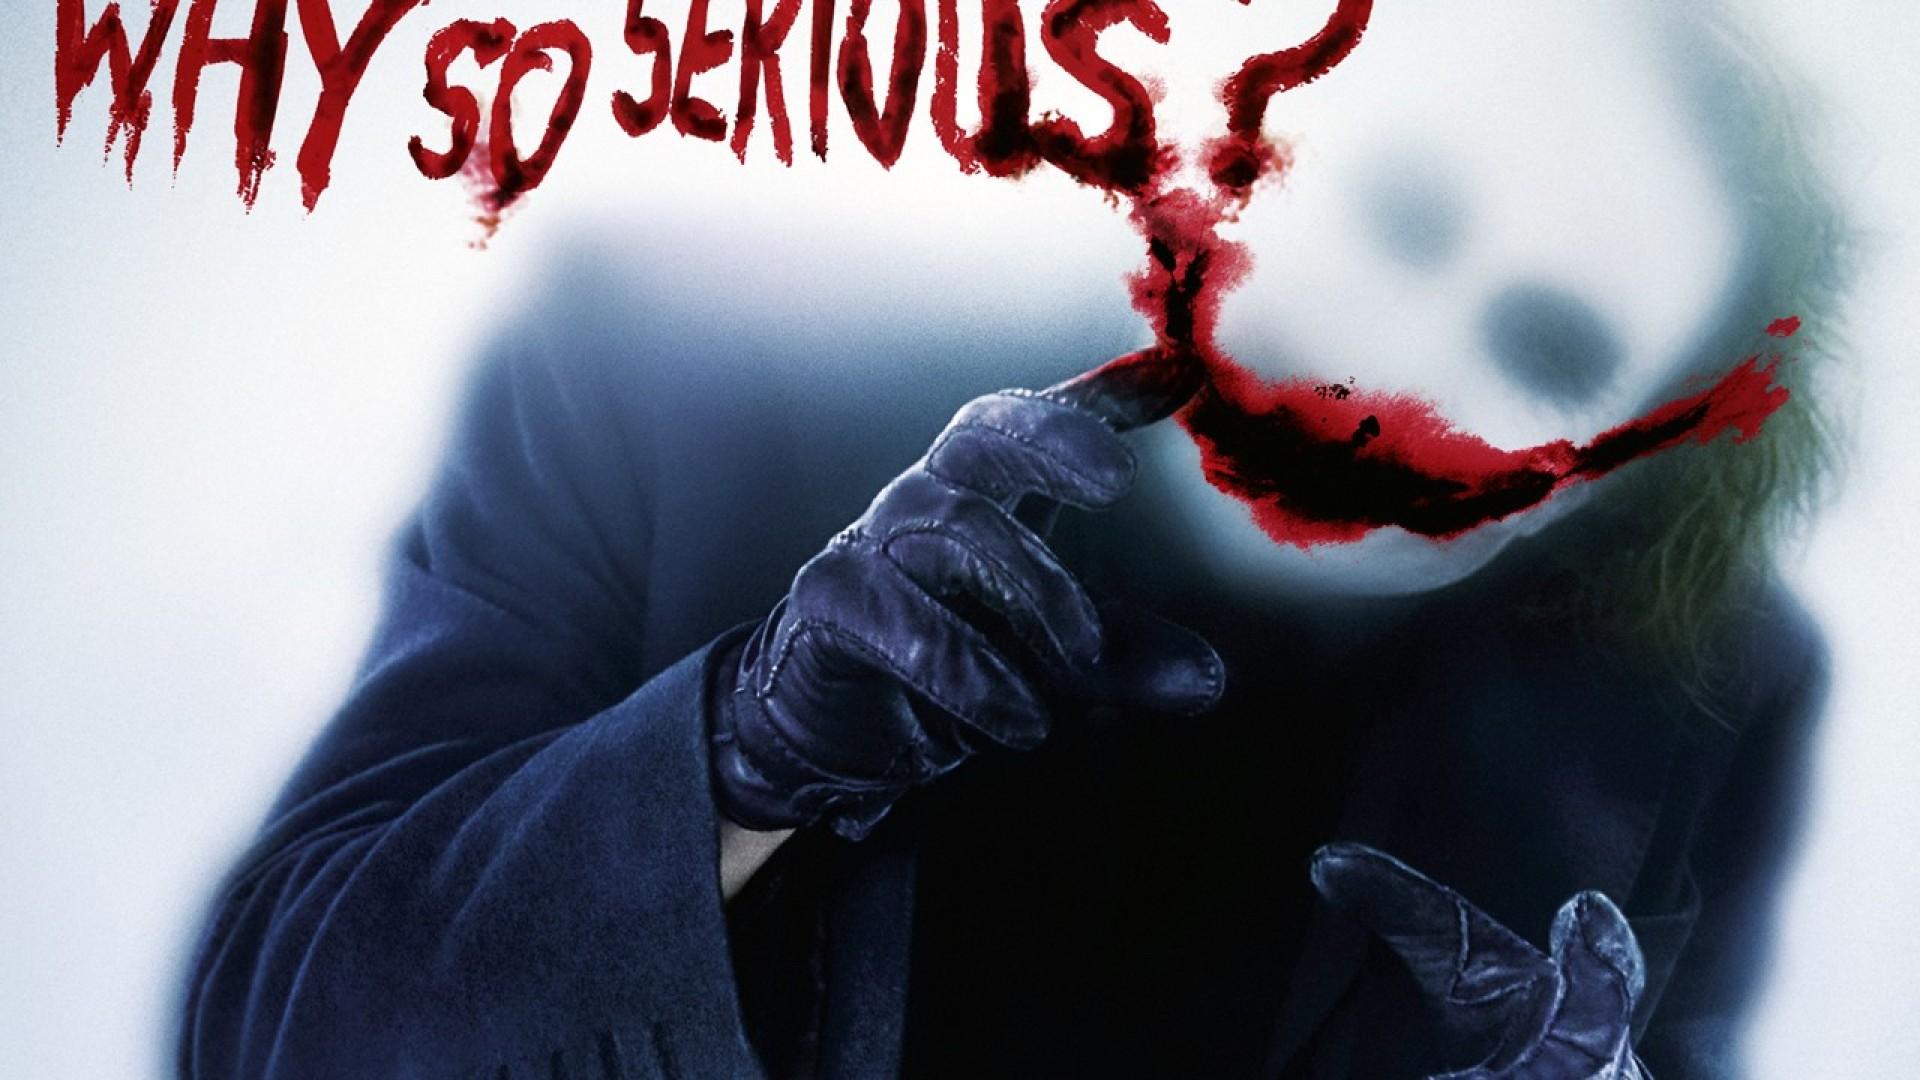 Joker Why So Serious Wallpapers Widescreen Sdeerwallpaper